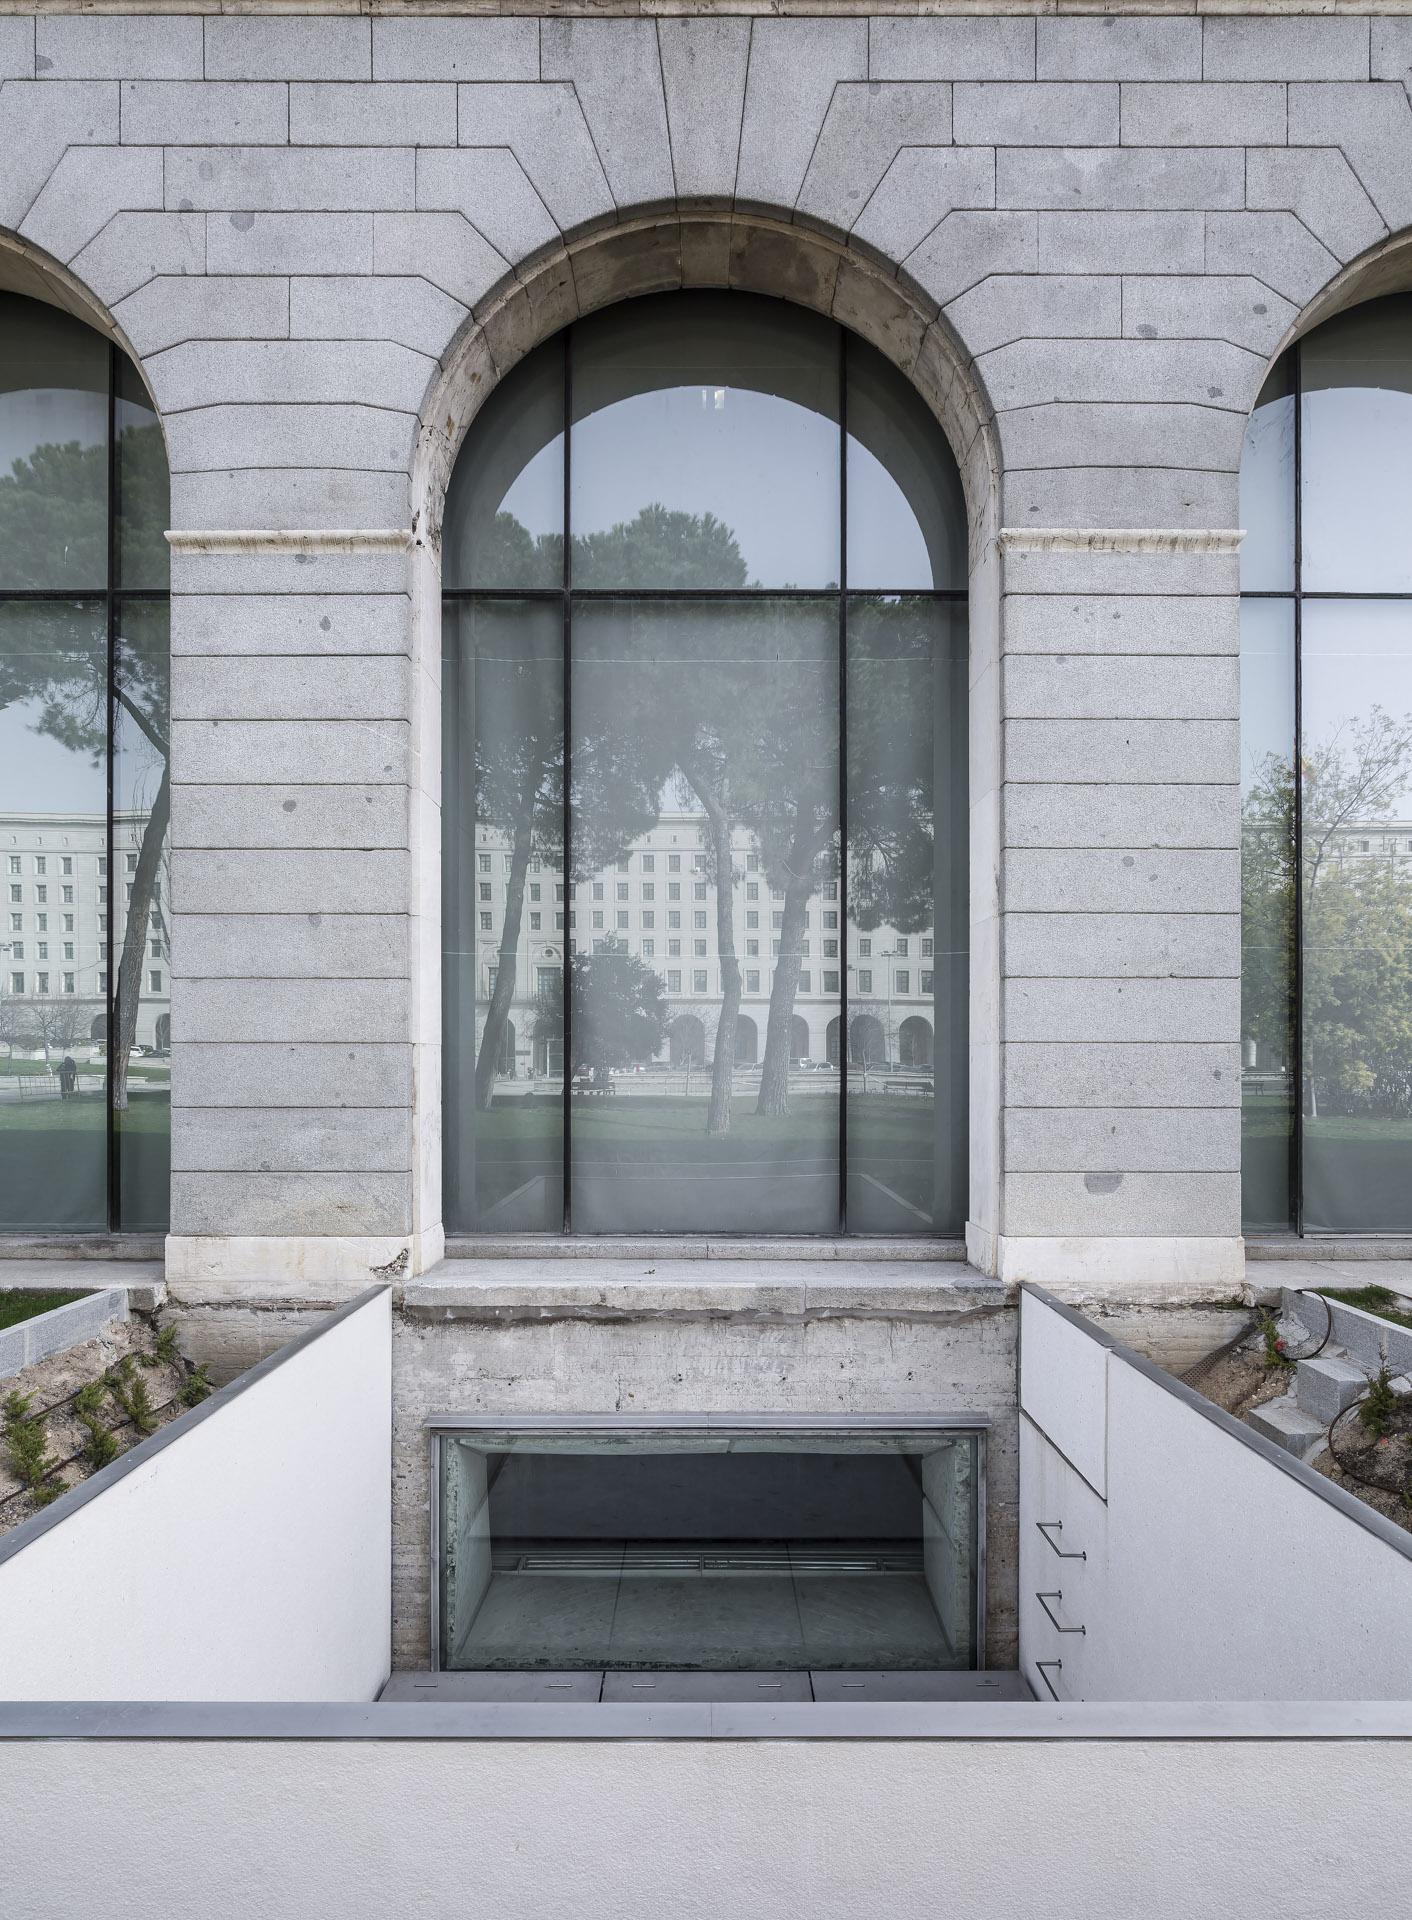 fotografia-arquitectura-madrid-nuevos-ministerios-elorza-german-cabo-05